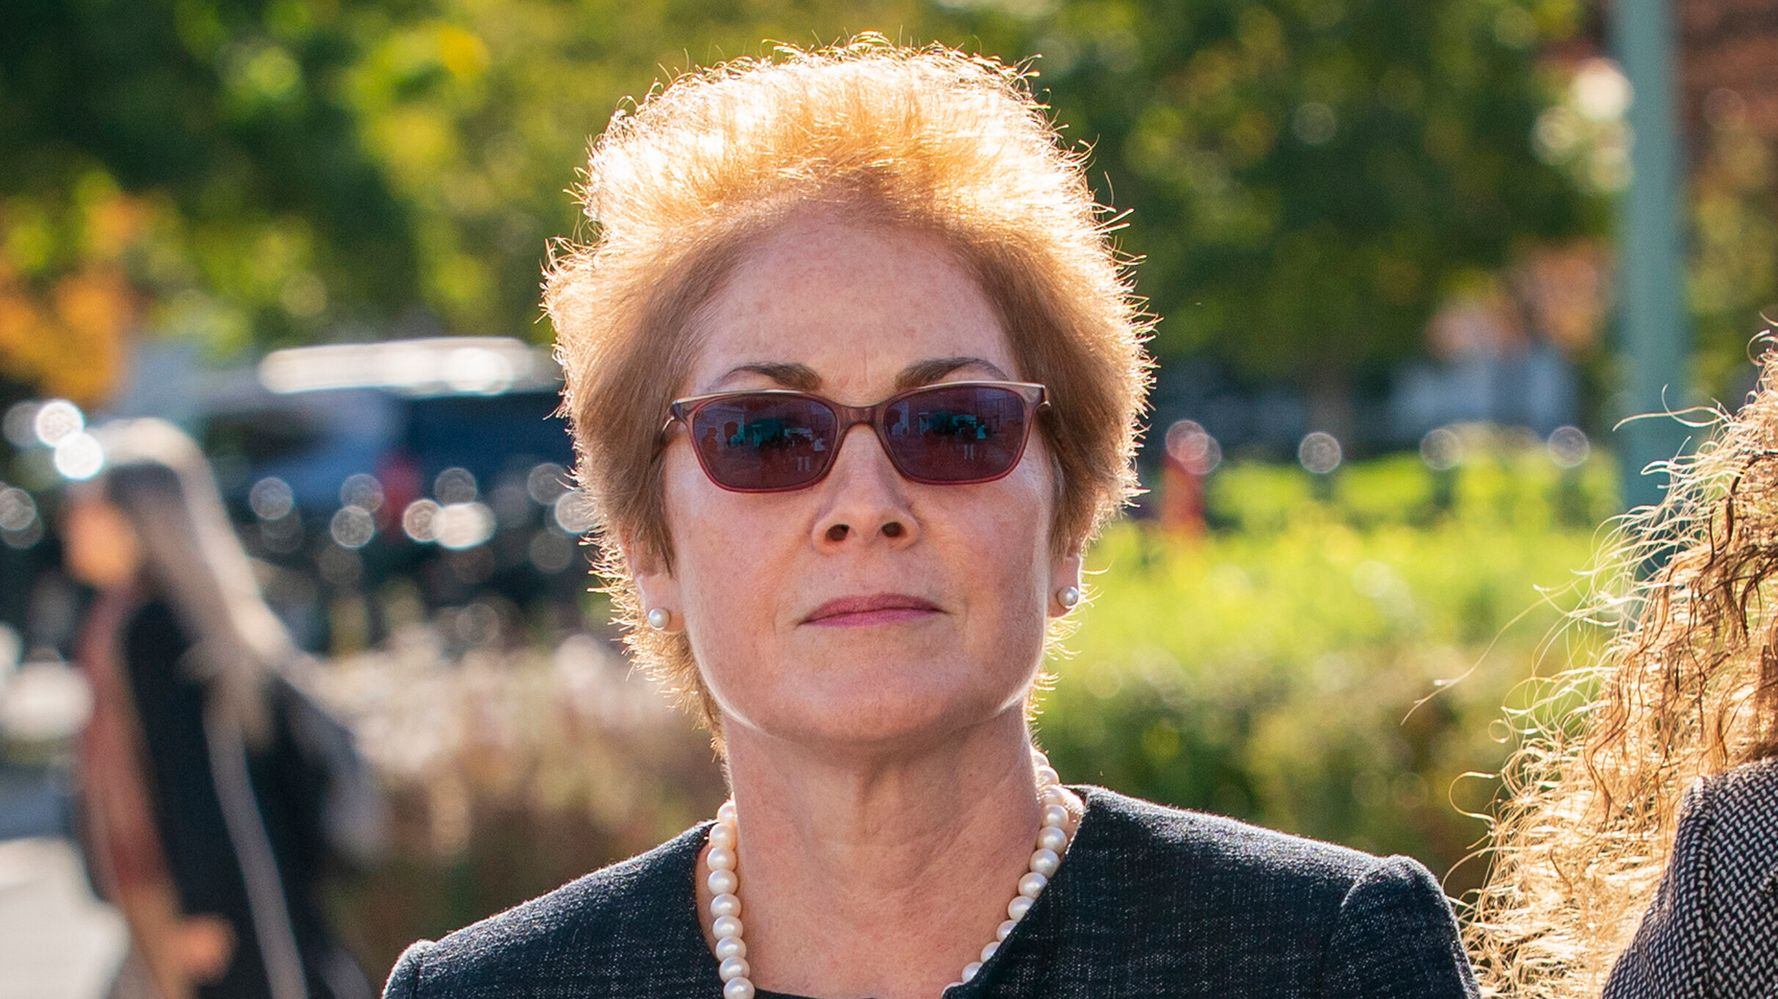 Westlake Legal Group 5dcd6f582500004c05d2d1ac Marie Yovanovitch, Ex-Ukraine Ambassador, Testifies In Trump Impeachment Hearing